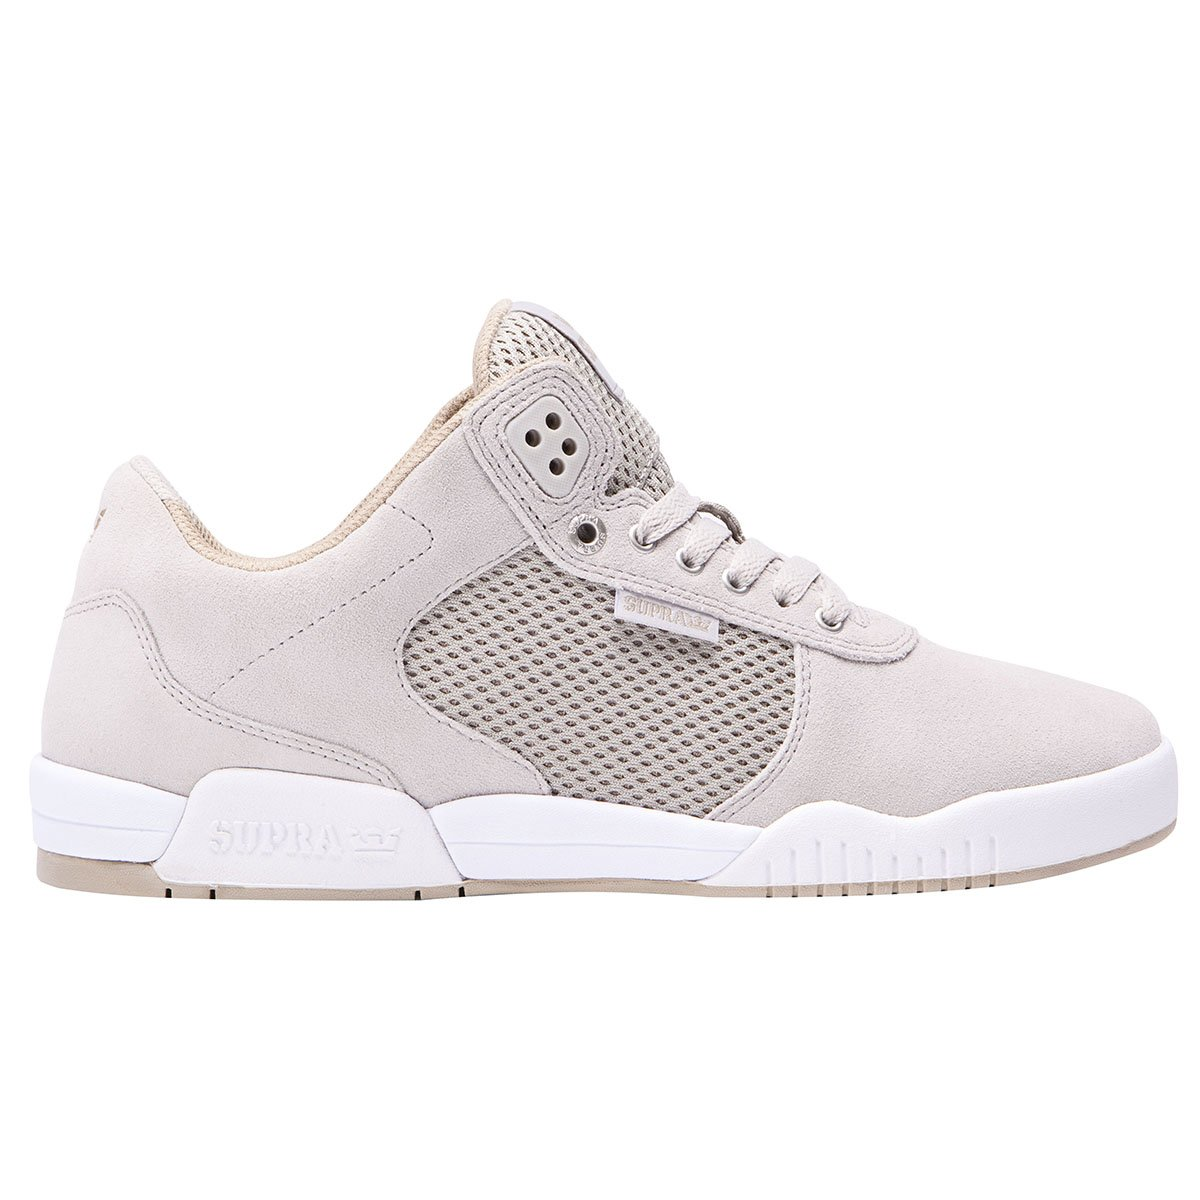 b5b332199d7b Galleon - Supra Mens Ellington Shoes Size 10 Light Grey - White